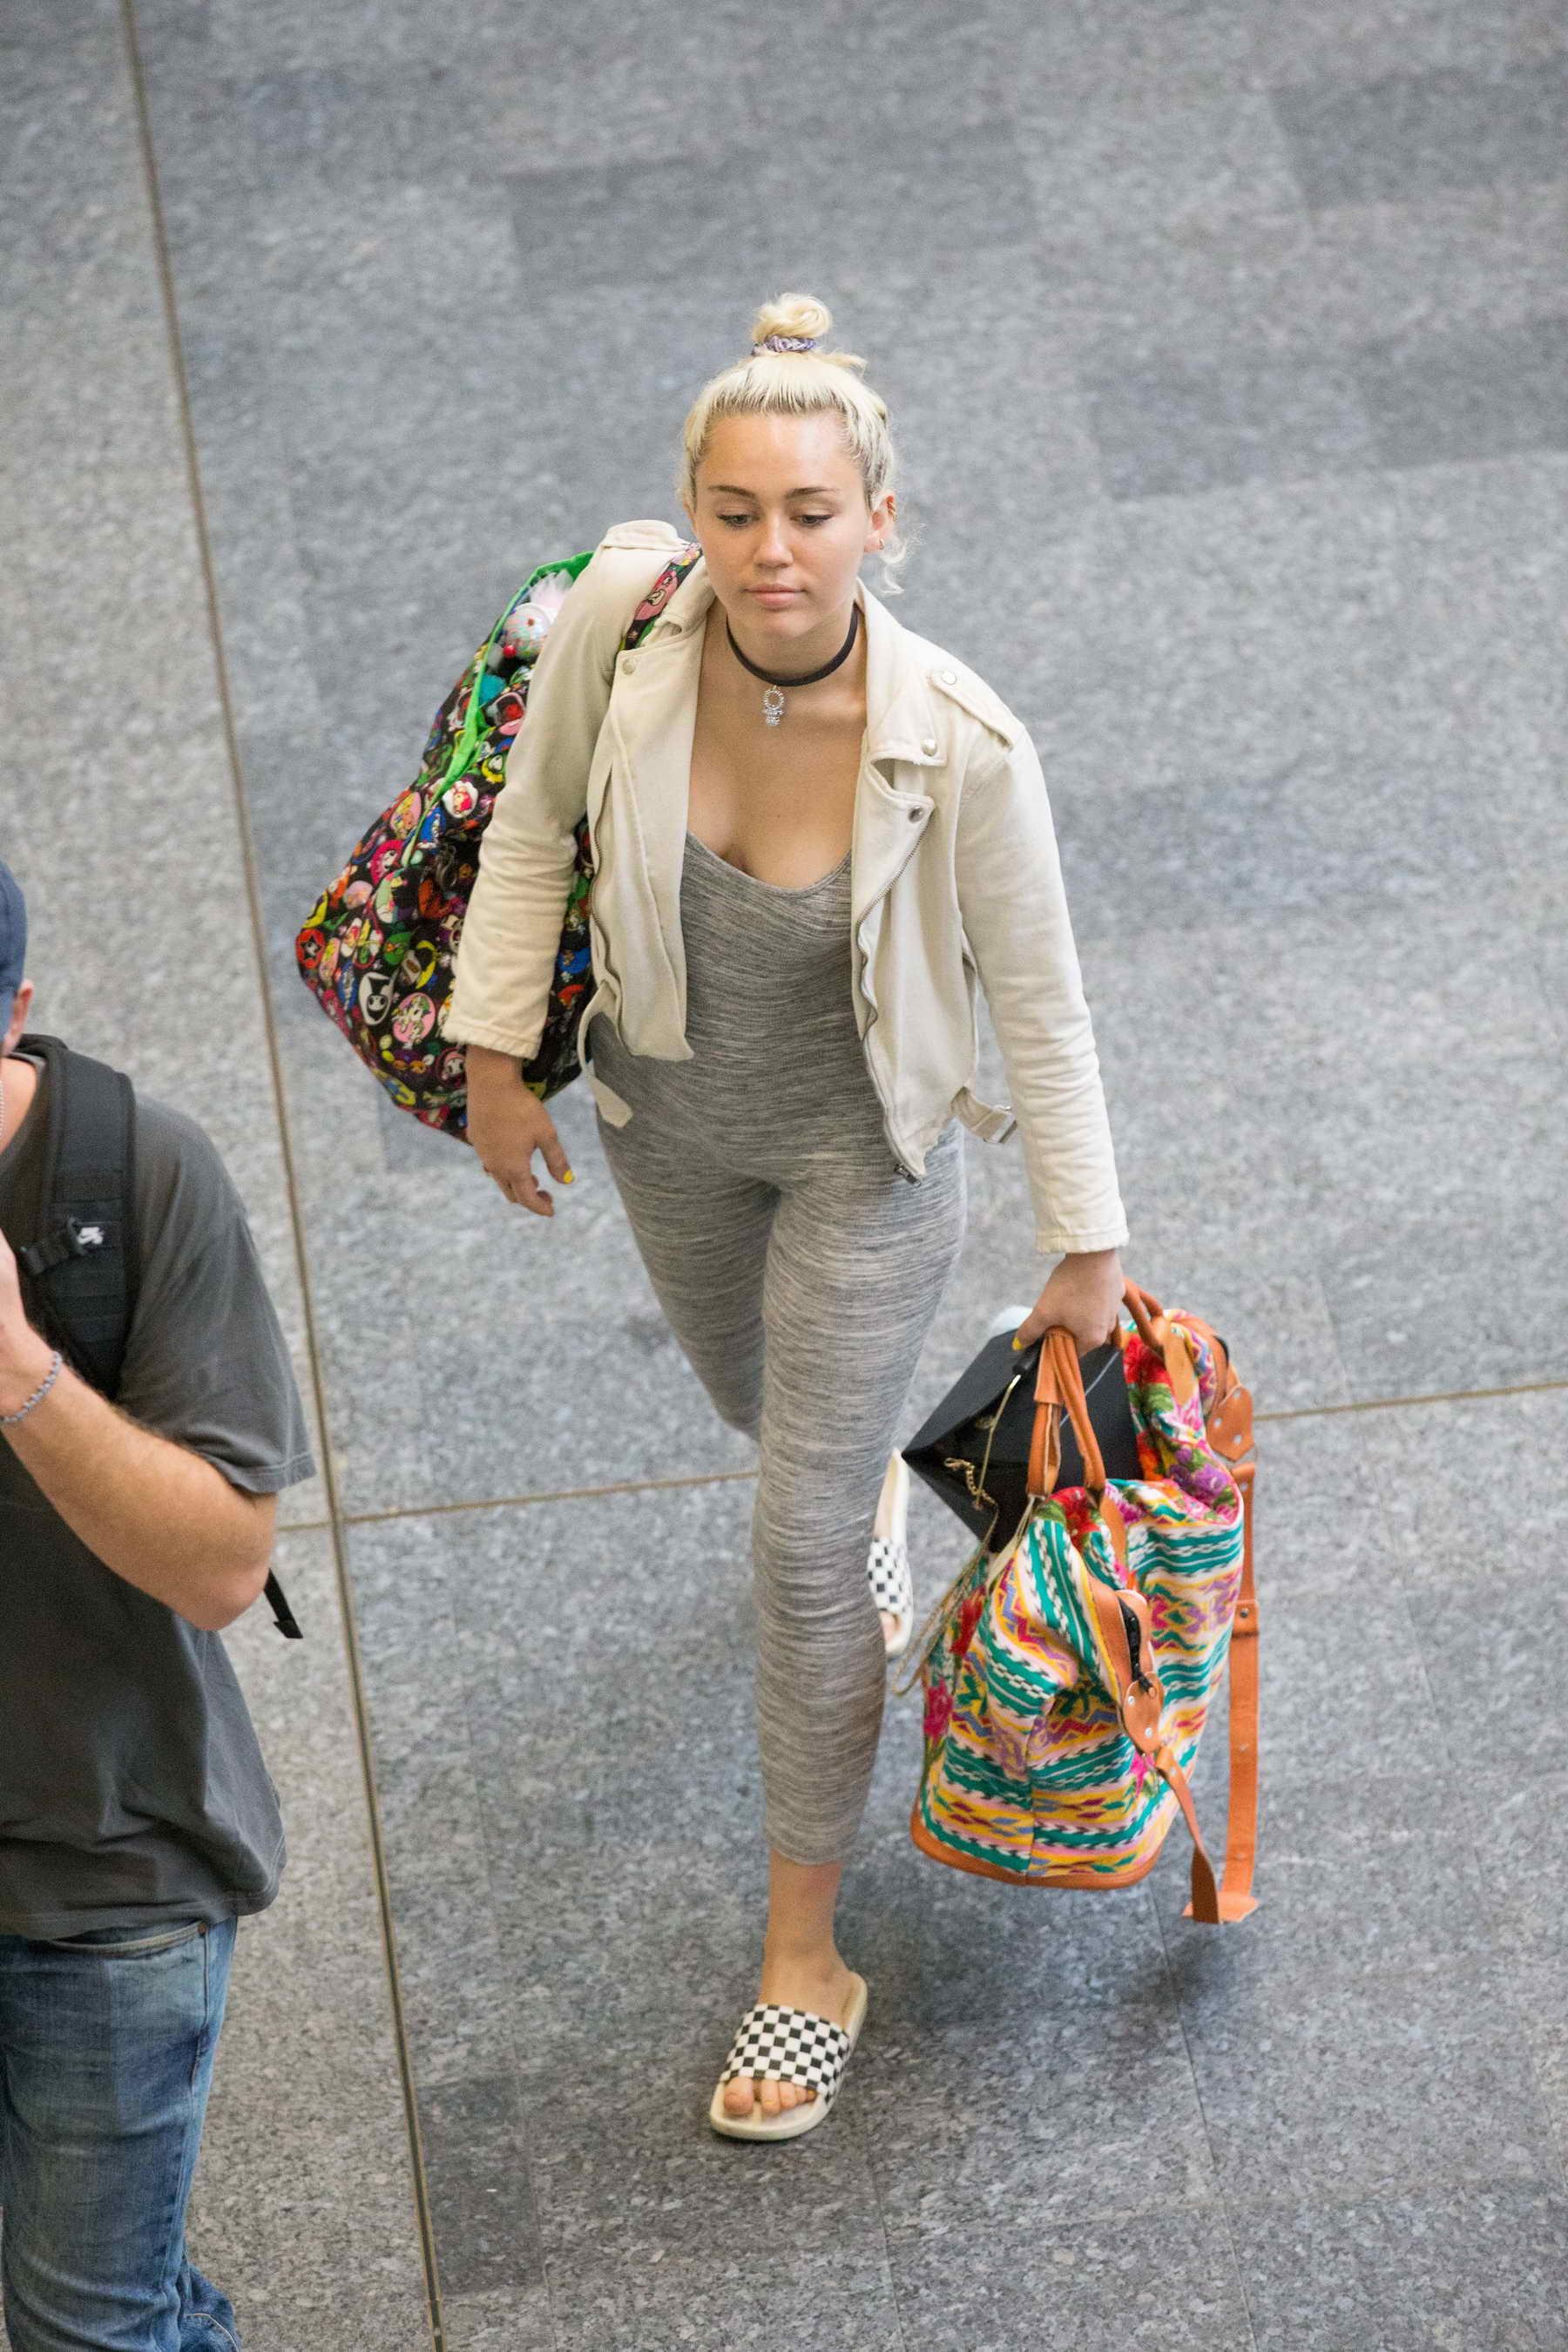 Miley cyrus dating in Brisbane